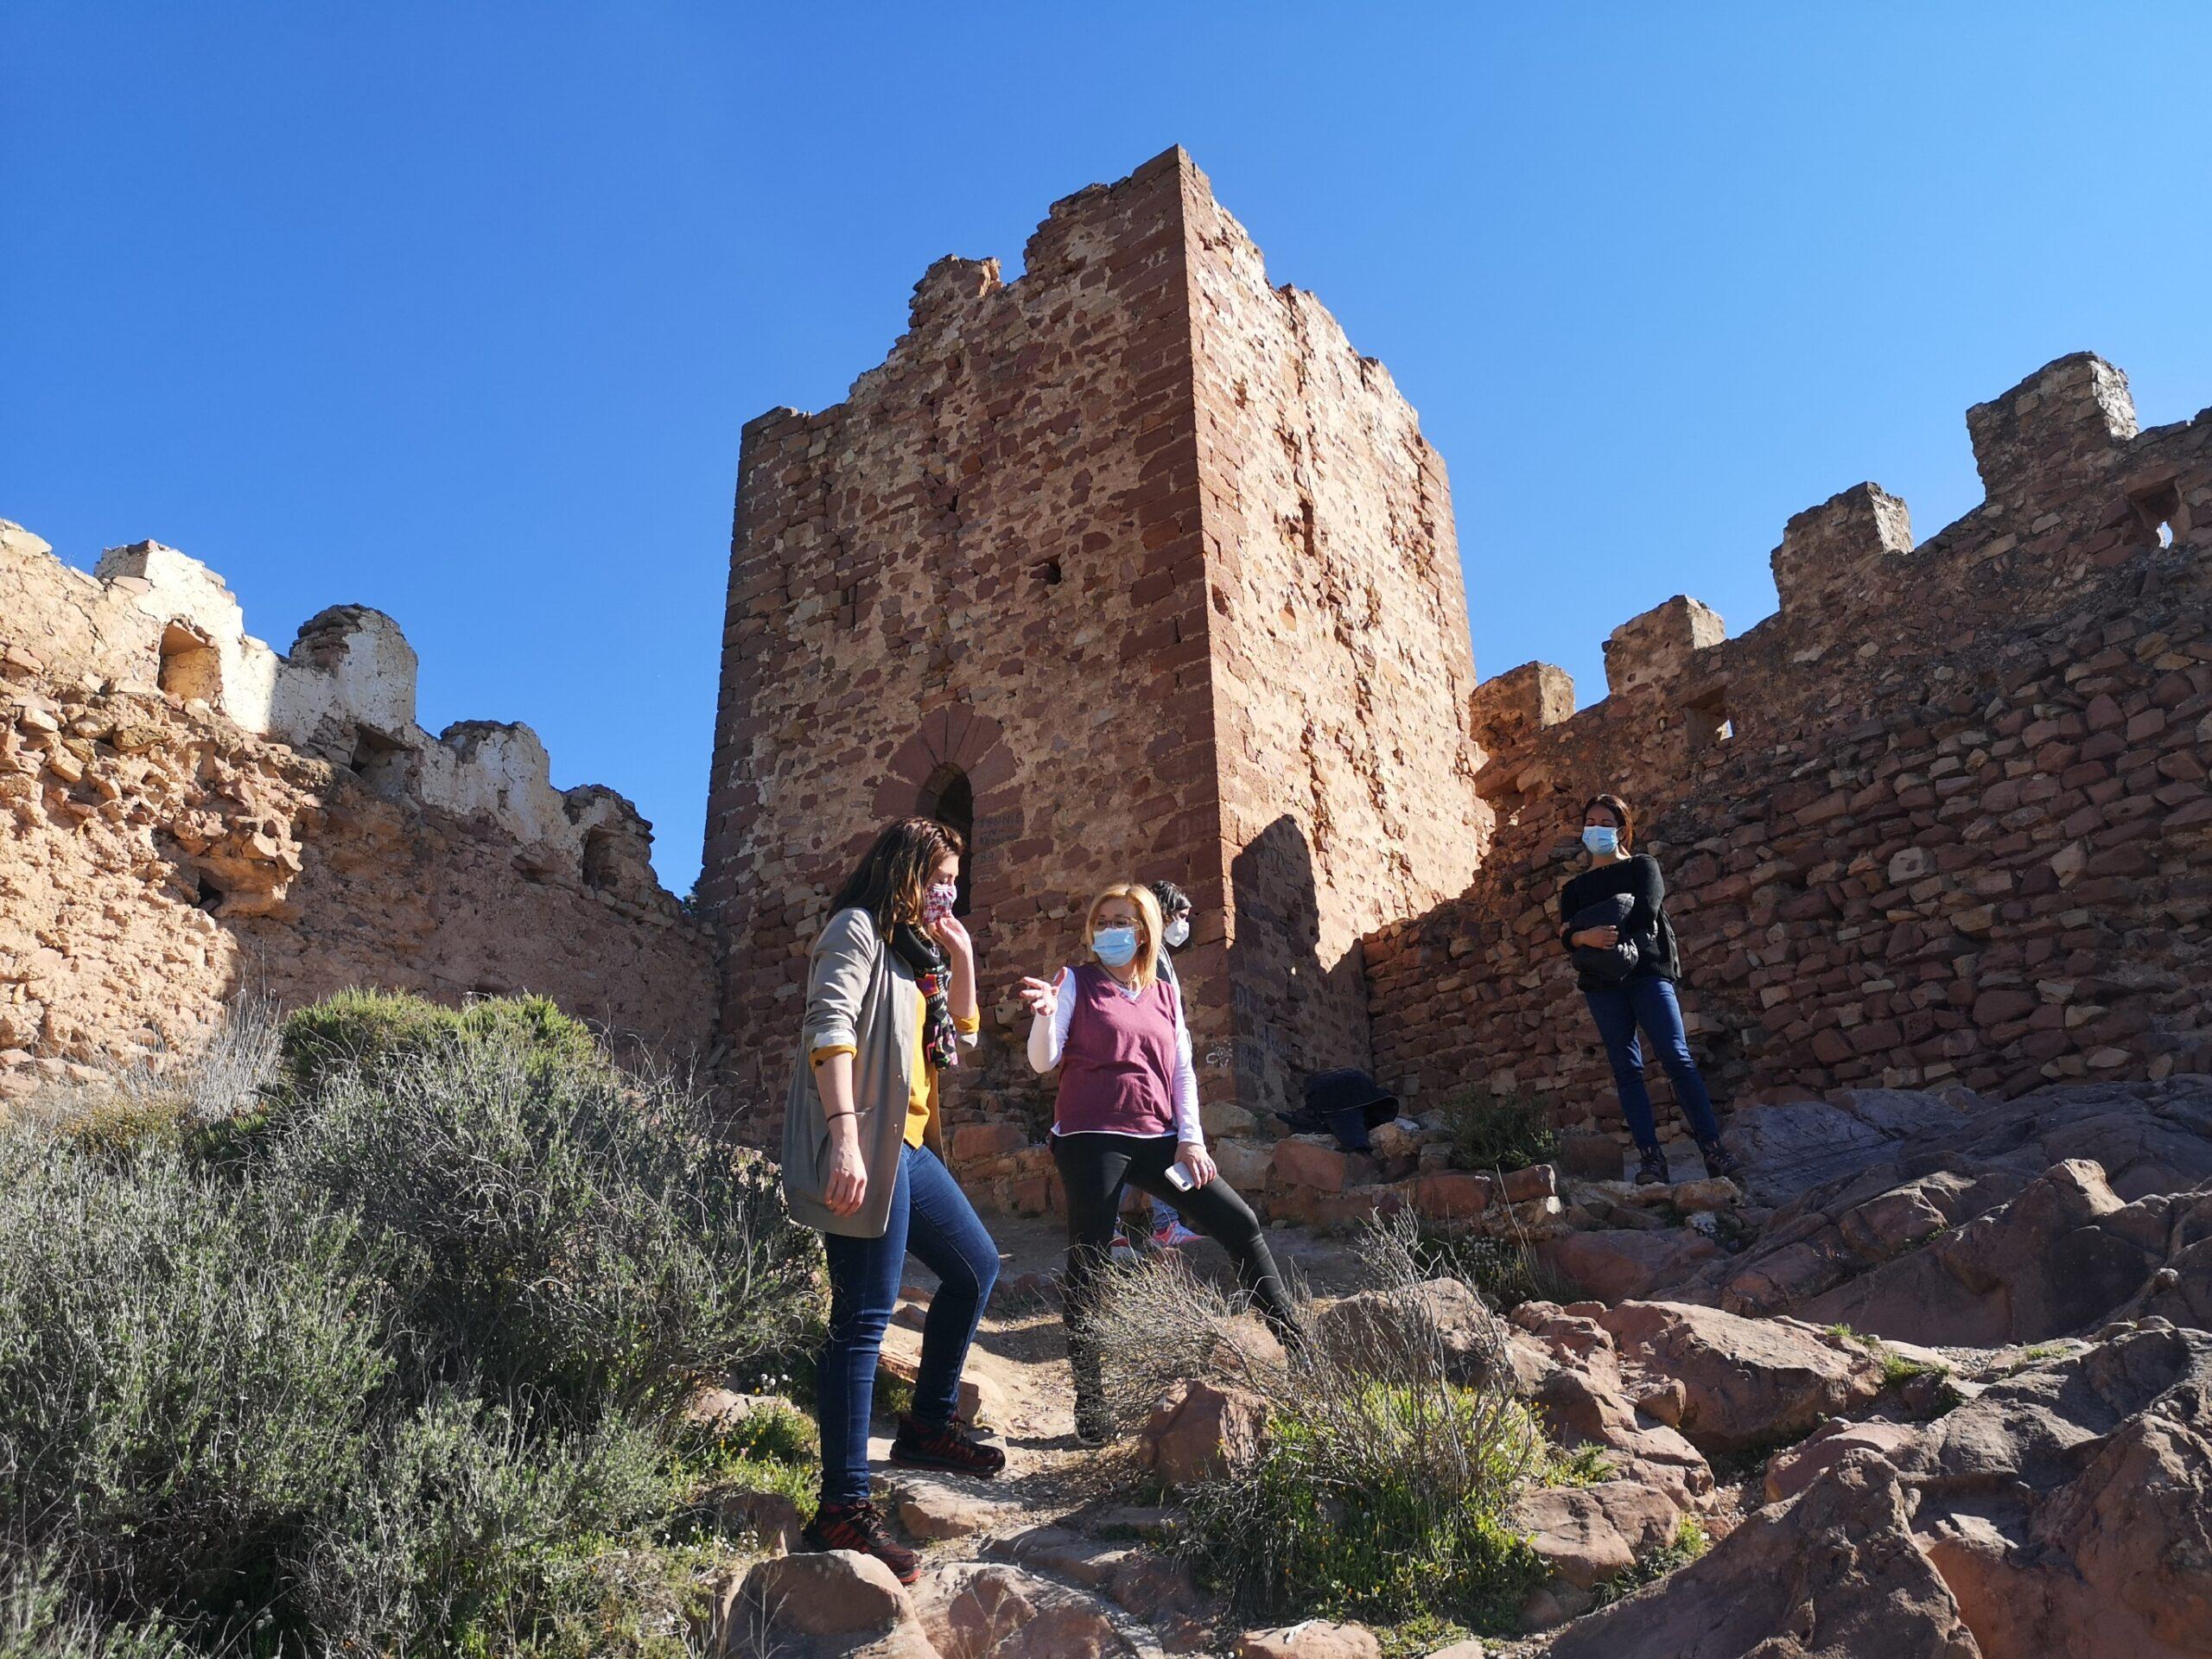 Serra begins the drafting of the Castell Master Plan